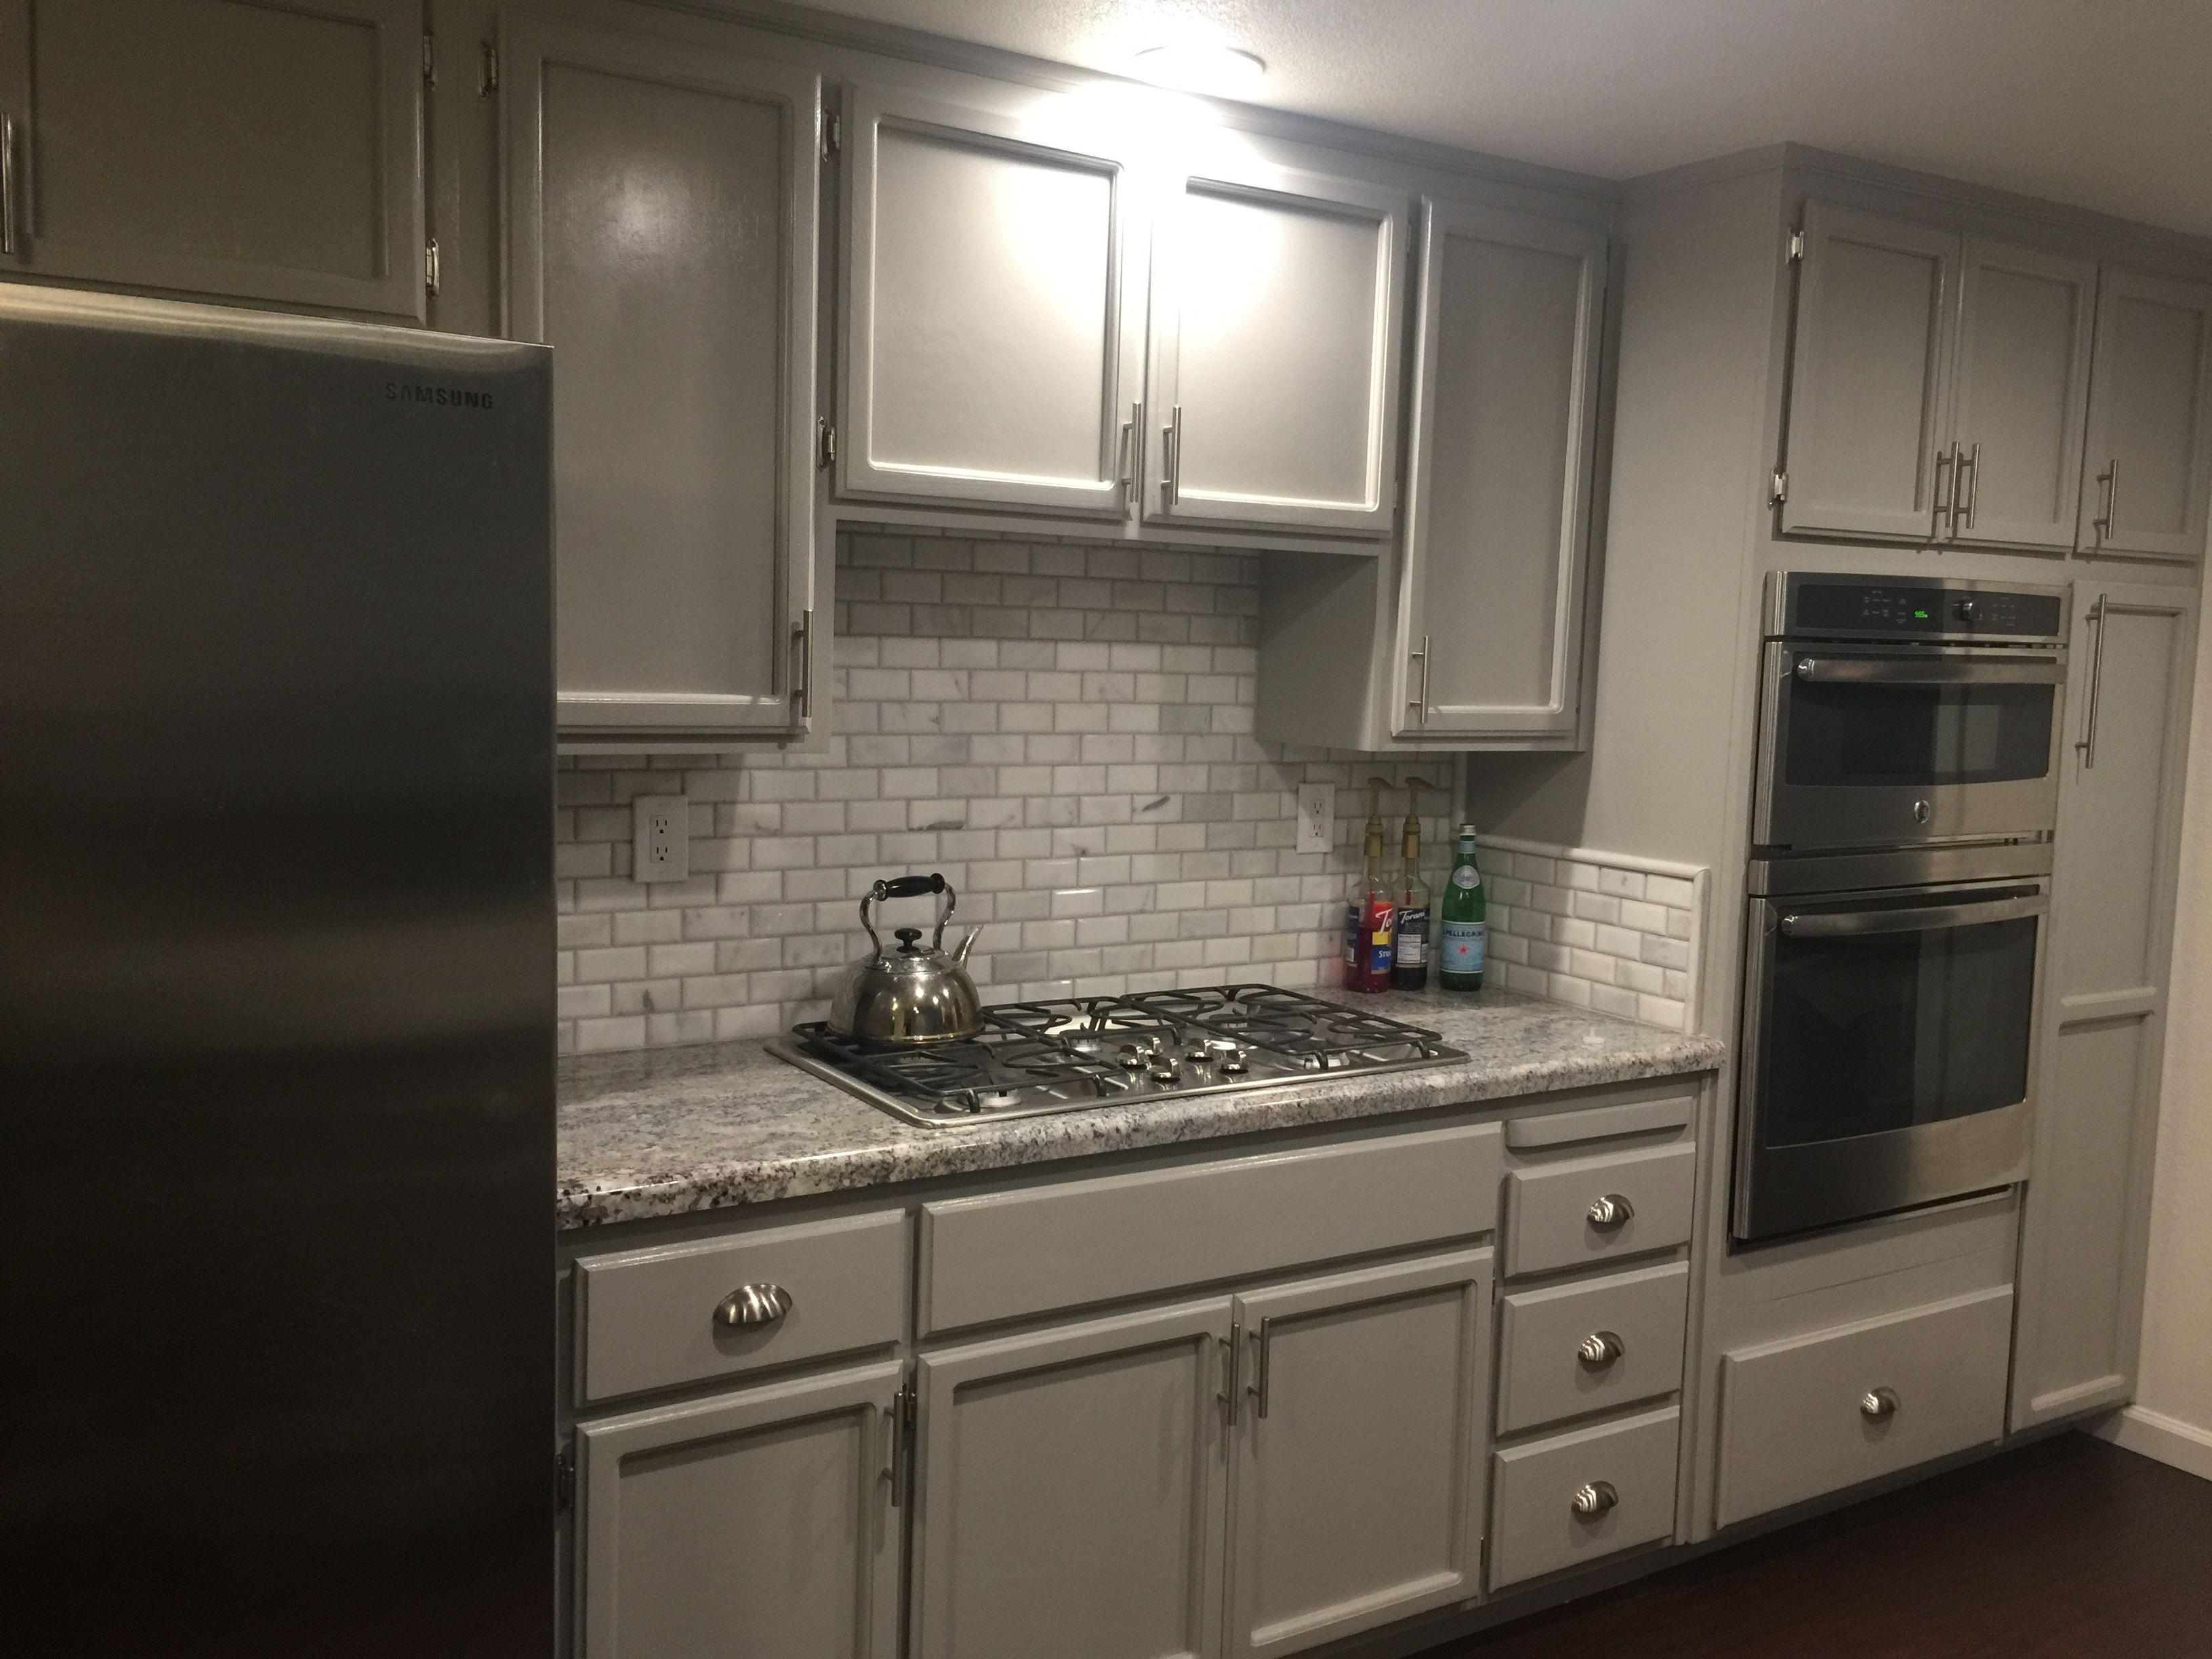 Monte Cristo Granite Marble backsplash tiles and grey